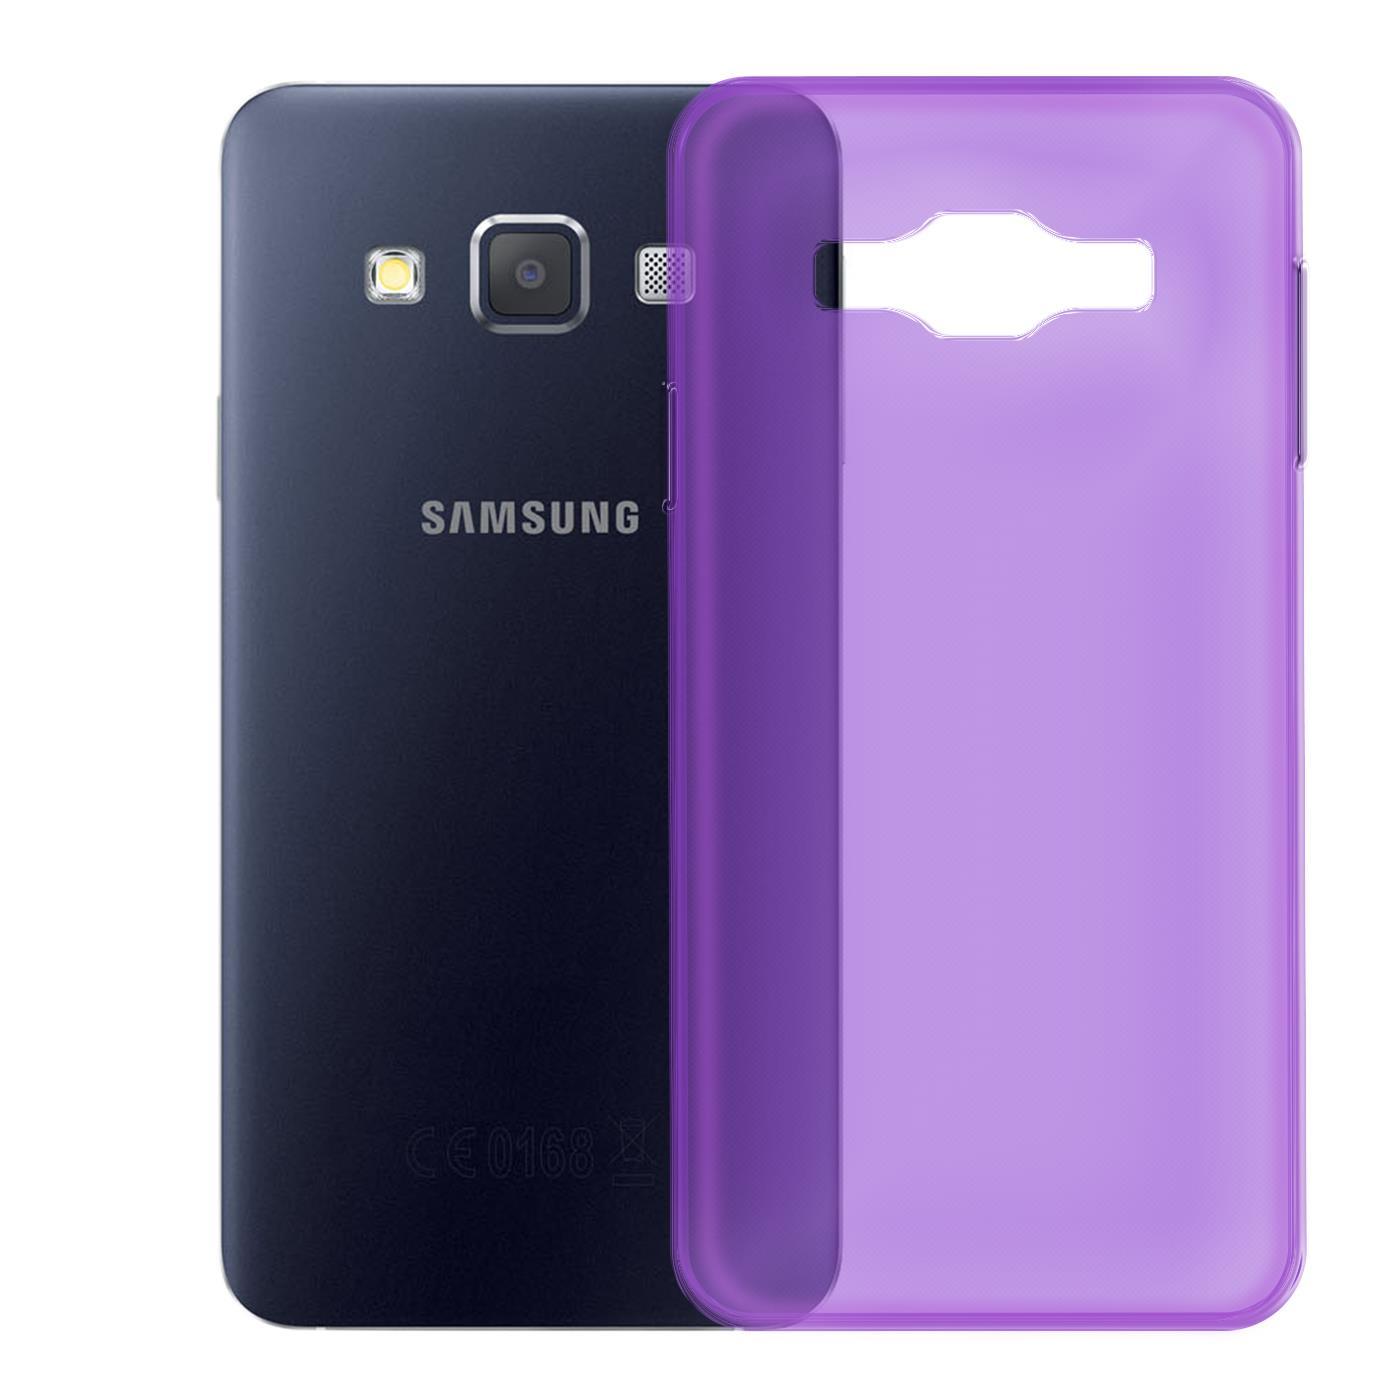 Samsung-Galaxy-A3-2015-Thin-Silicone-Clear-Case-Cover-Ultra-Slim-Shockproof-Gel Indexbild 18